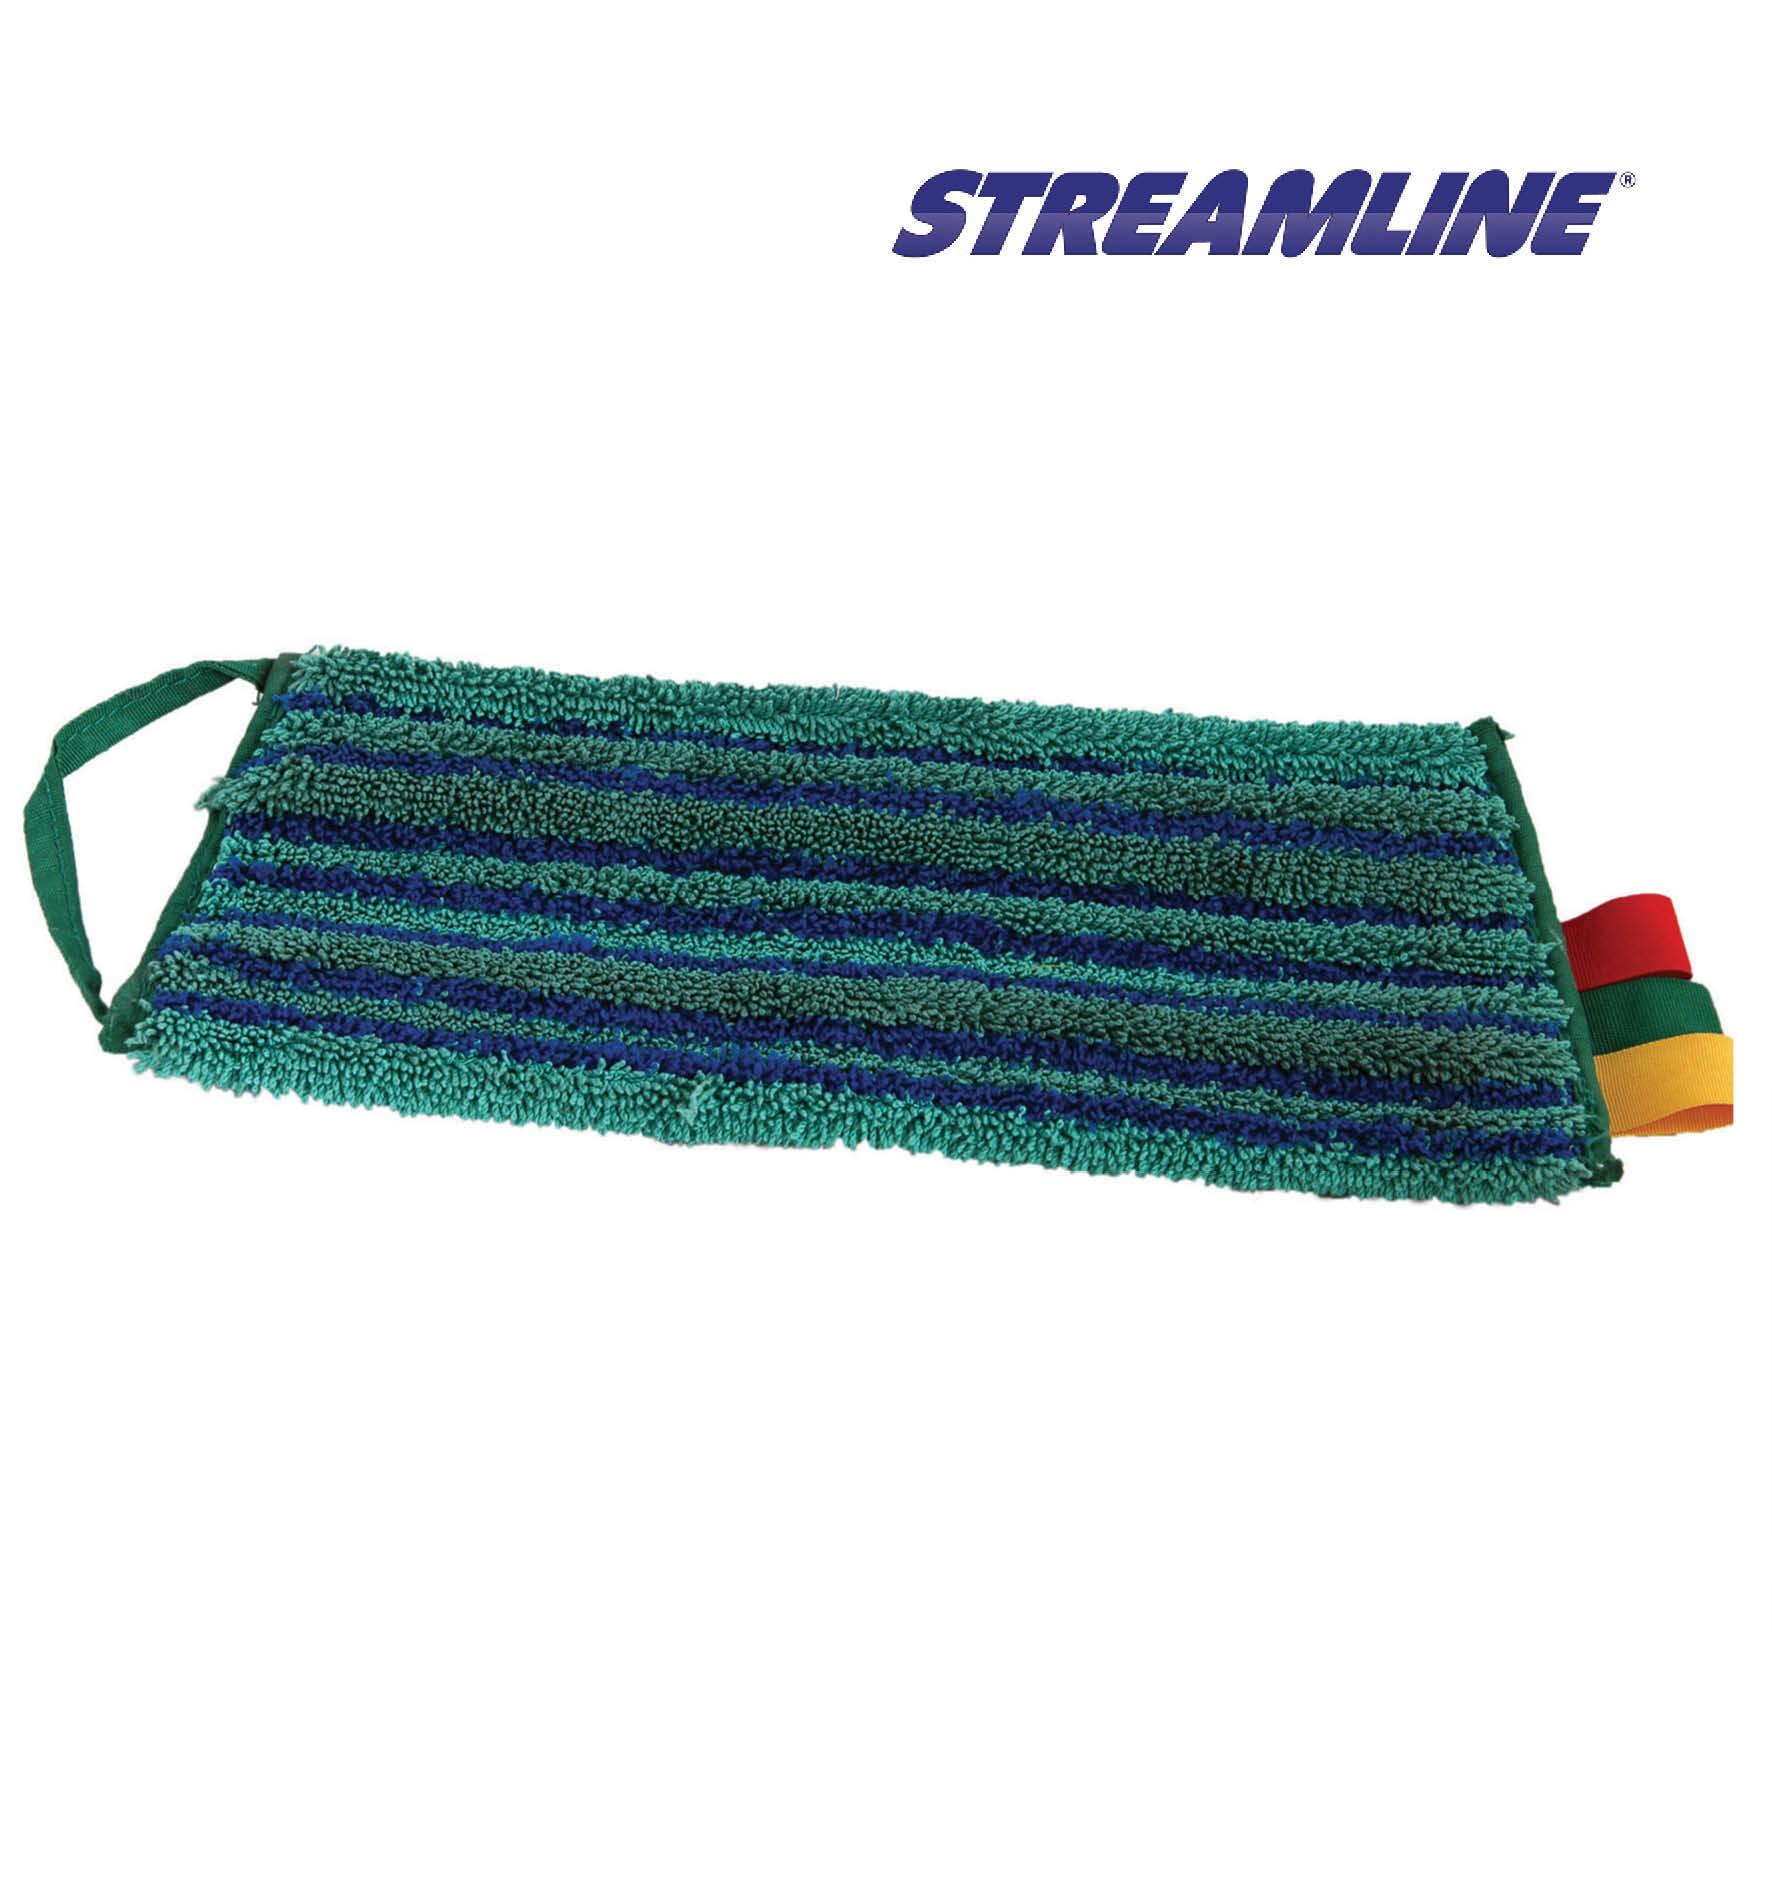 Streamline Equipment High Reach Cleaning Wfp Window